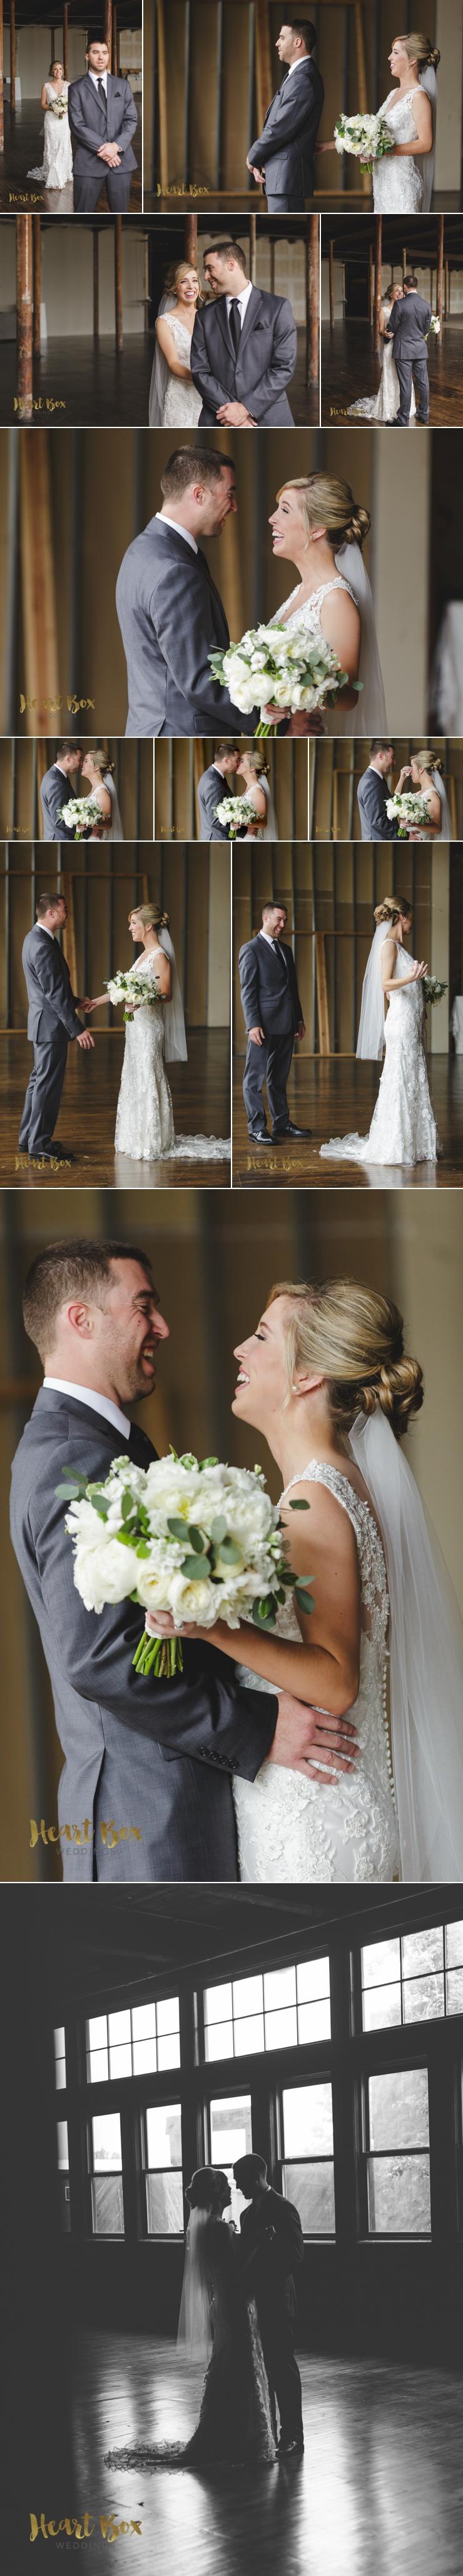 Popplewell Wedding Blog Collages 12.jpg